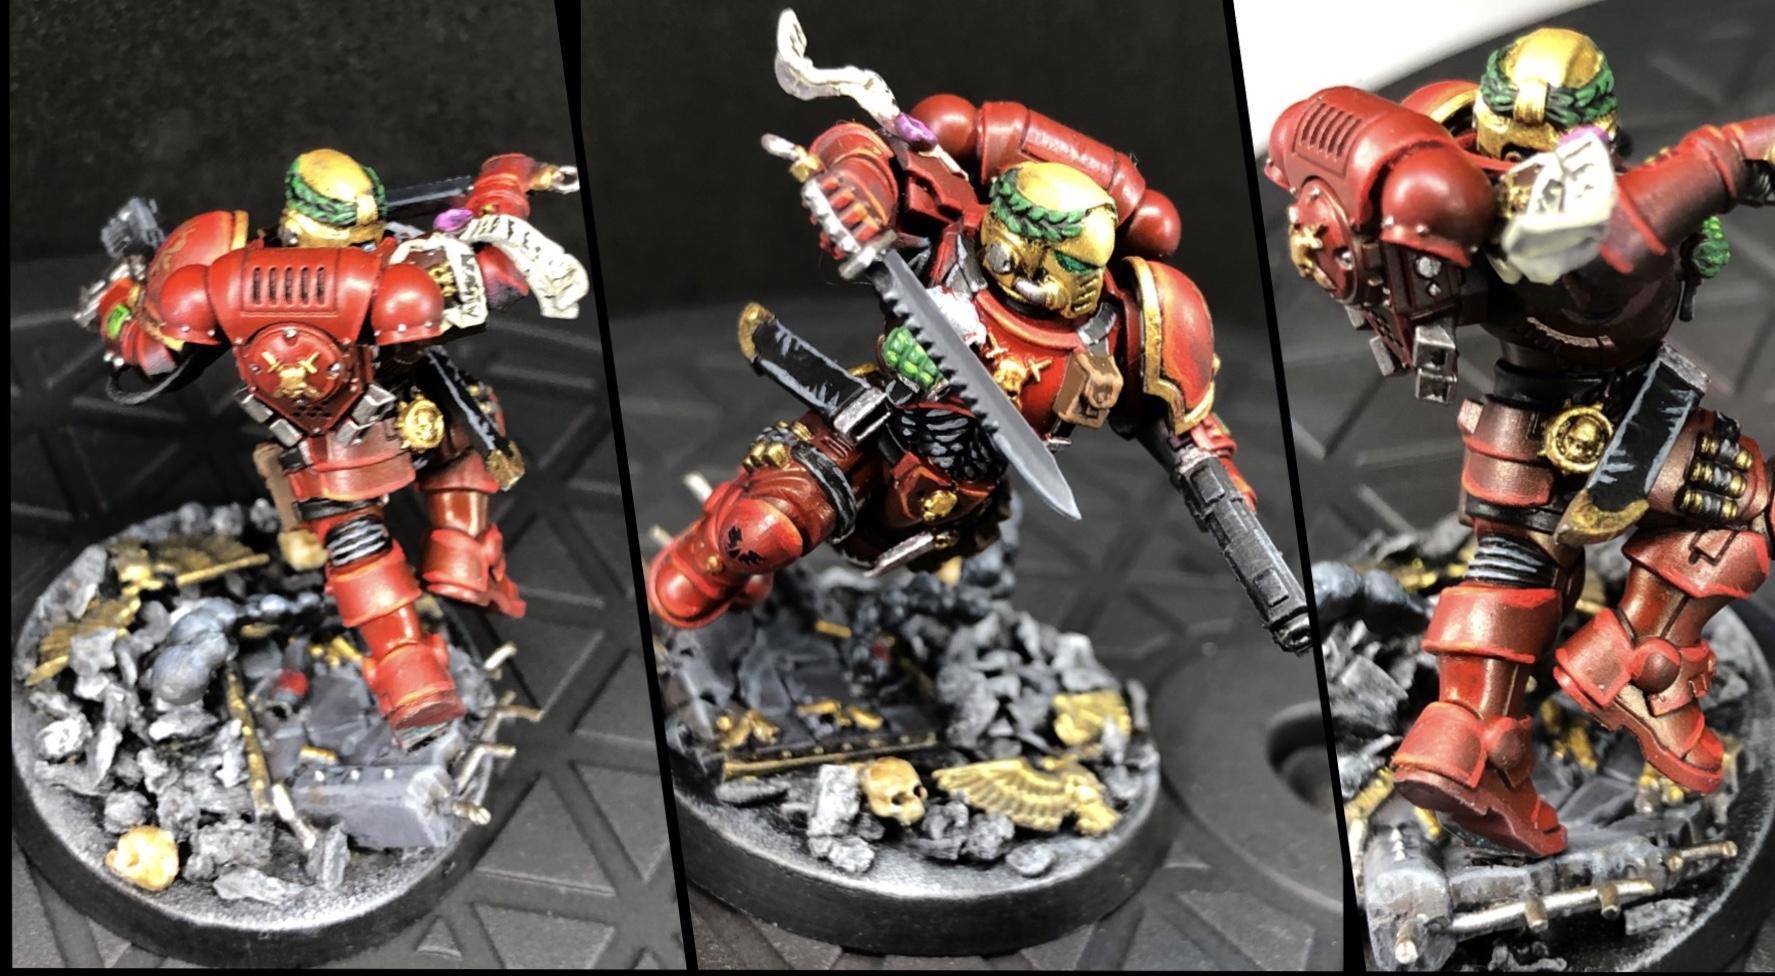 Blood Angels, Lieutenant, Phobos, Primaris, Primaris Marines, Space Marines, Urban, Warhammer 40,000, Warhammer Fantasy